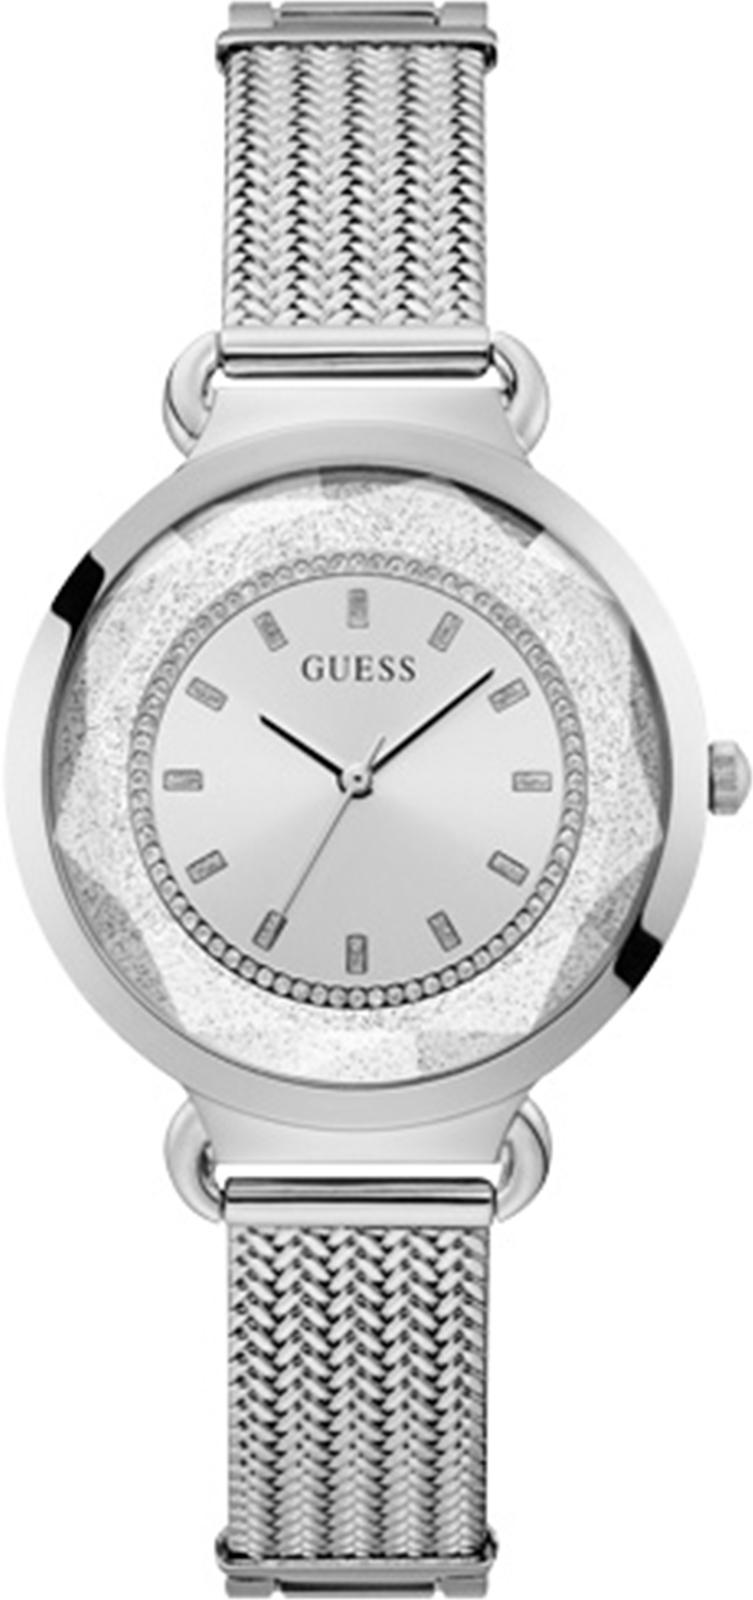 цена Часы Guess TESSA онлайн в 2017 году